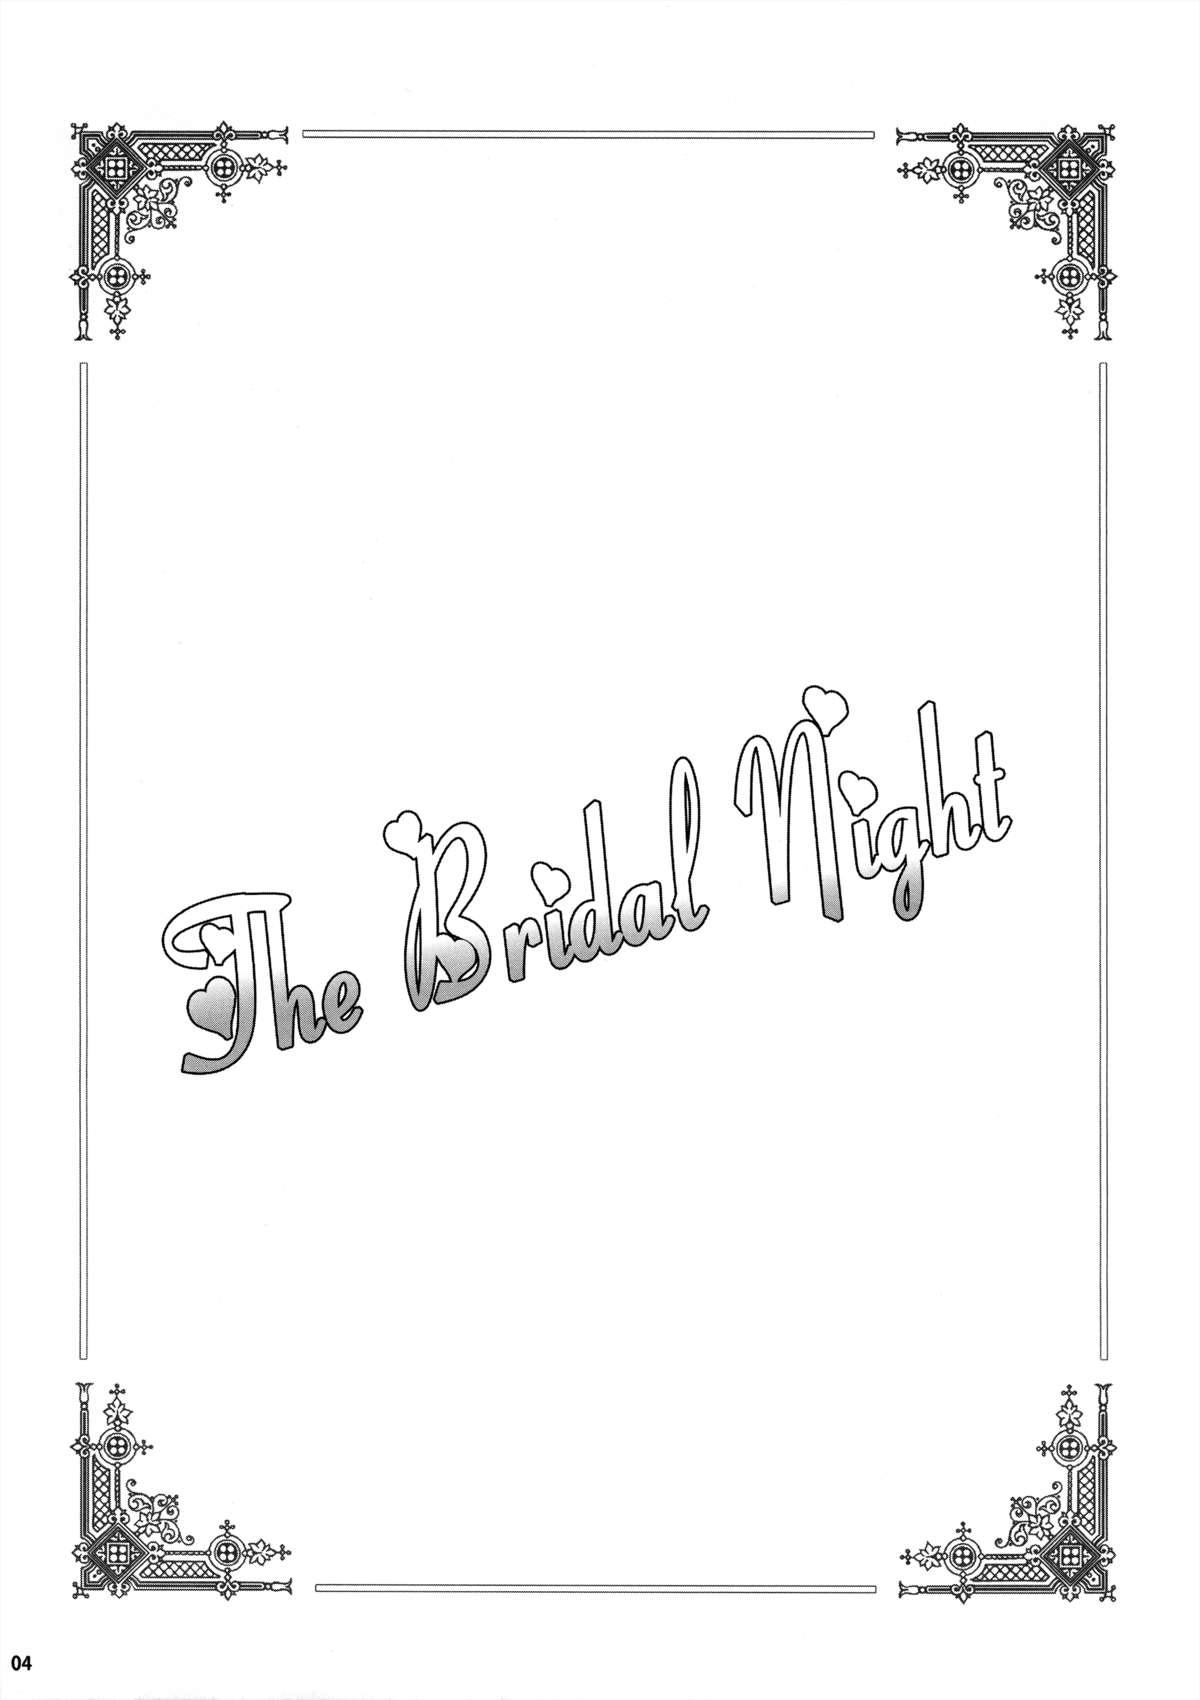 The Bridal Night 2